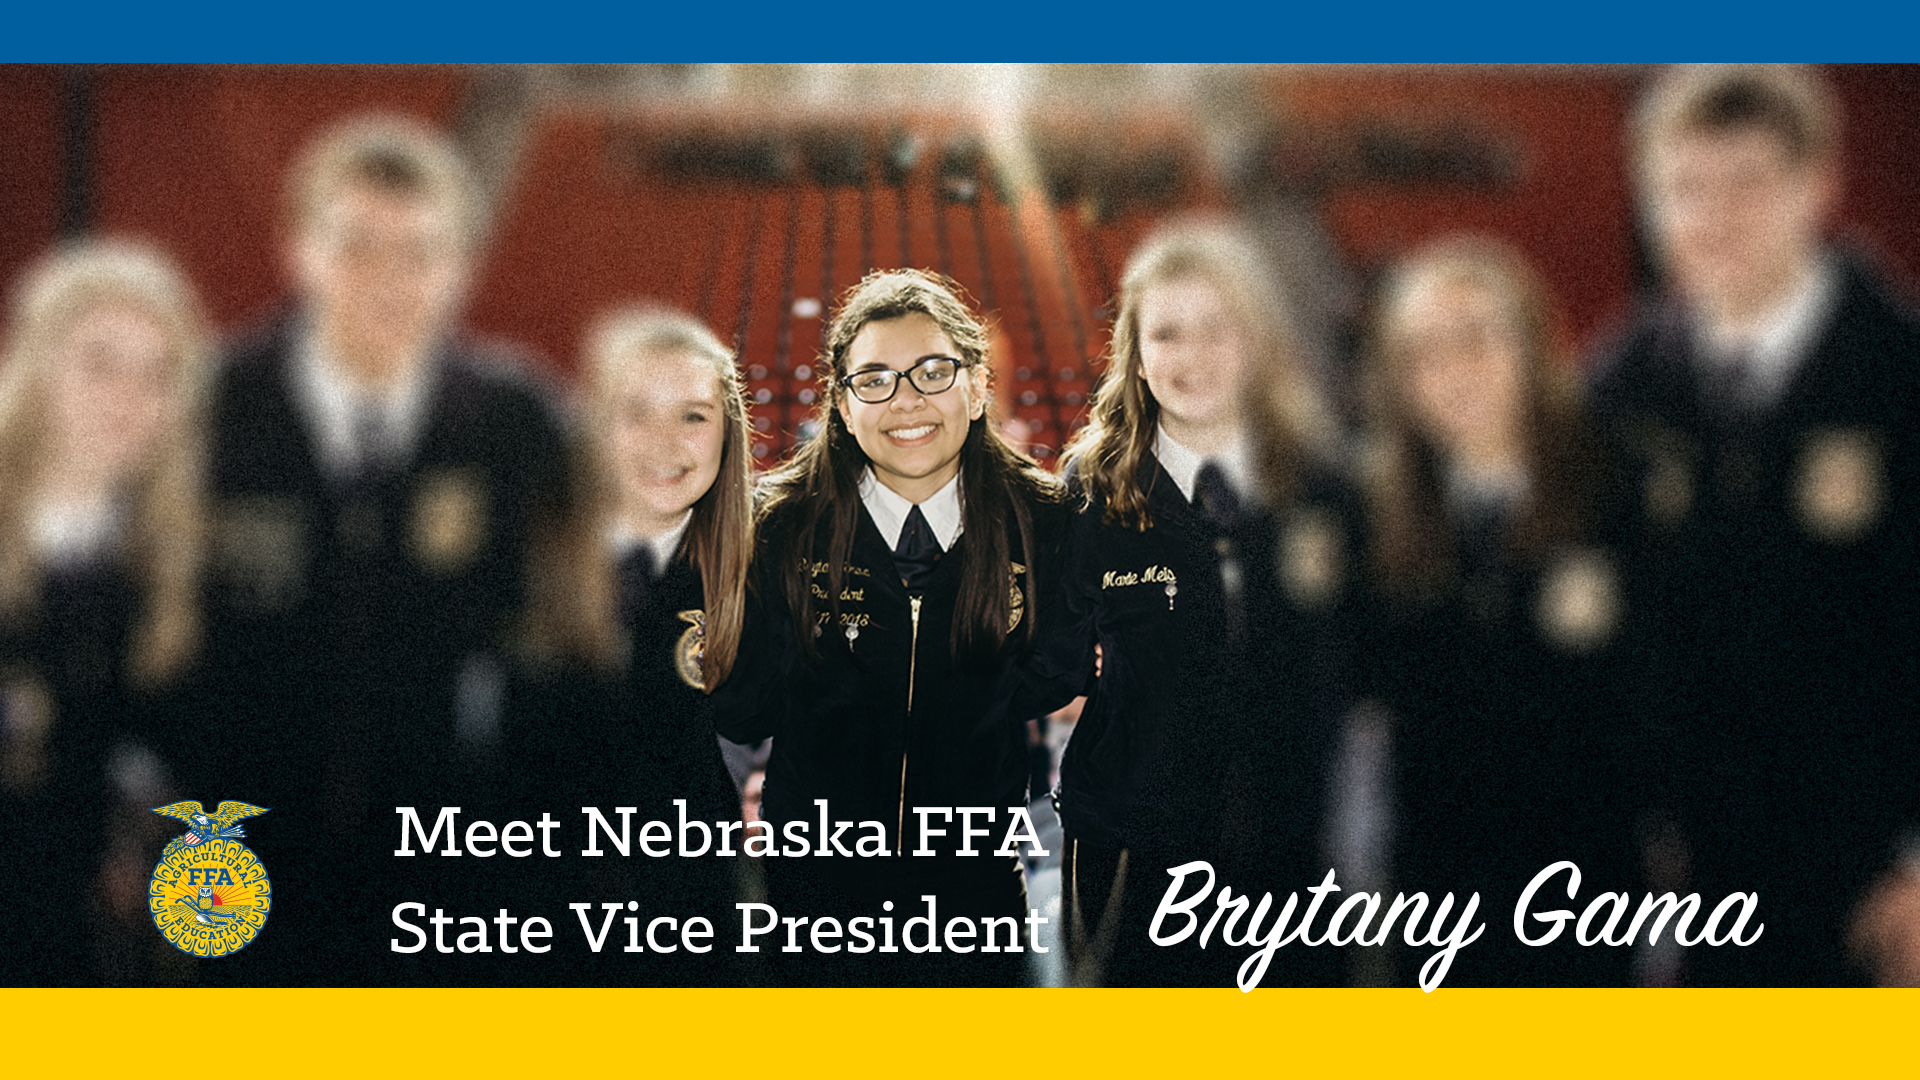 Meet Your 2018-19 Nebraska FFA State Vice President: Brytany Gama